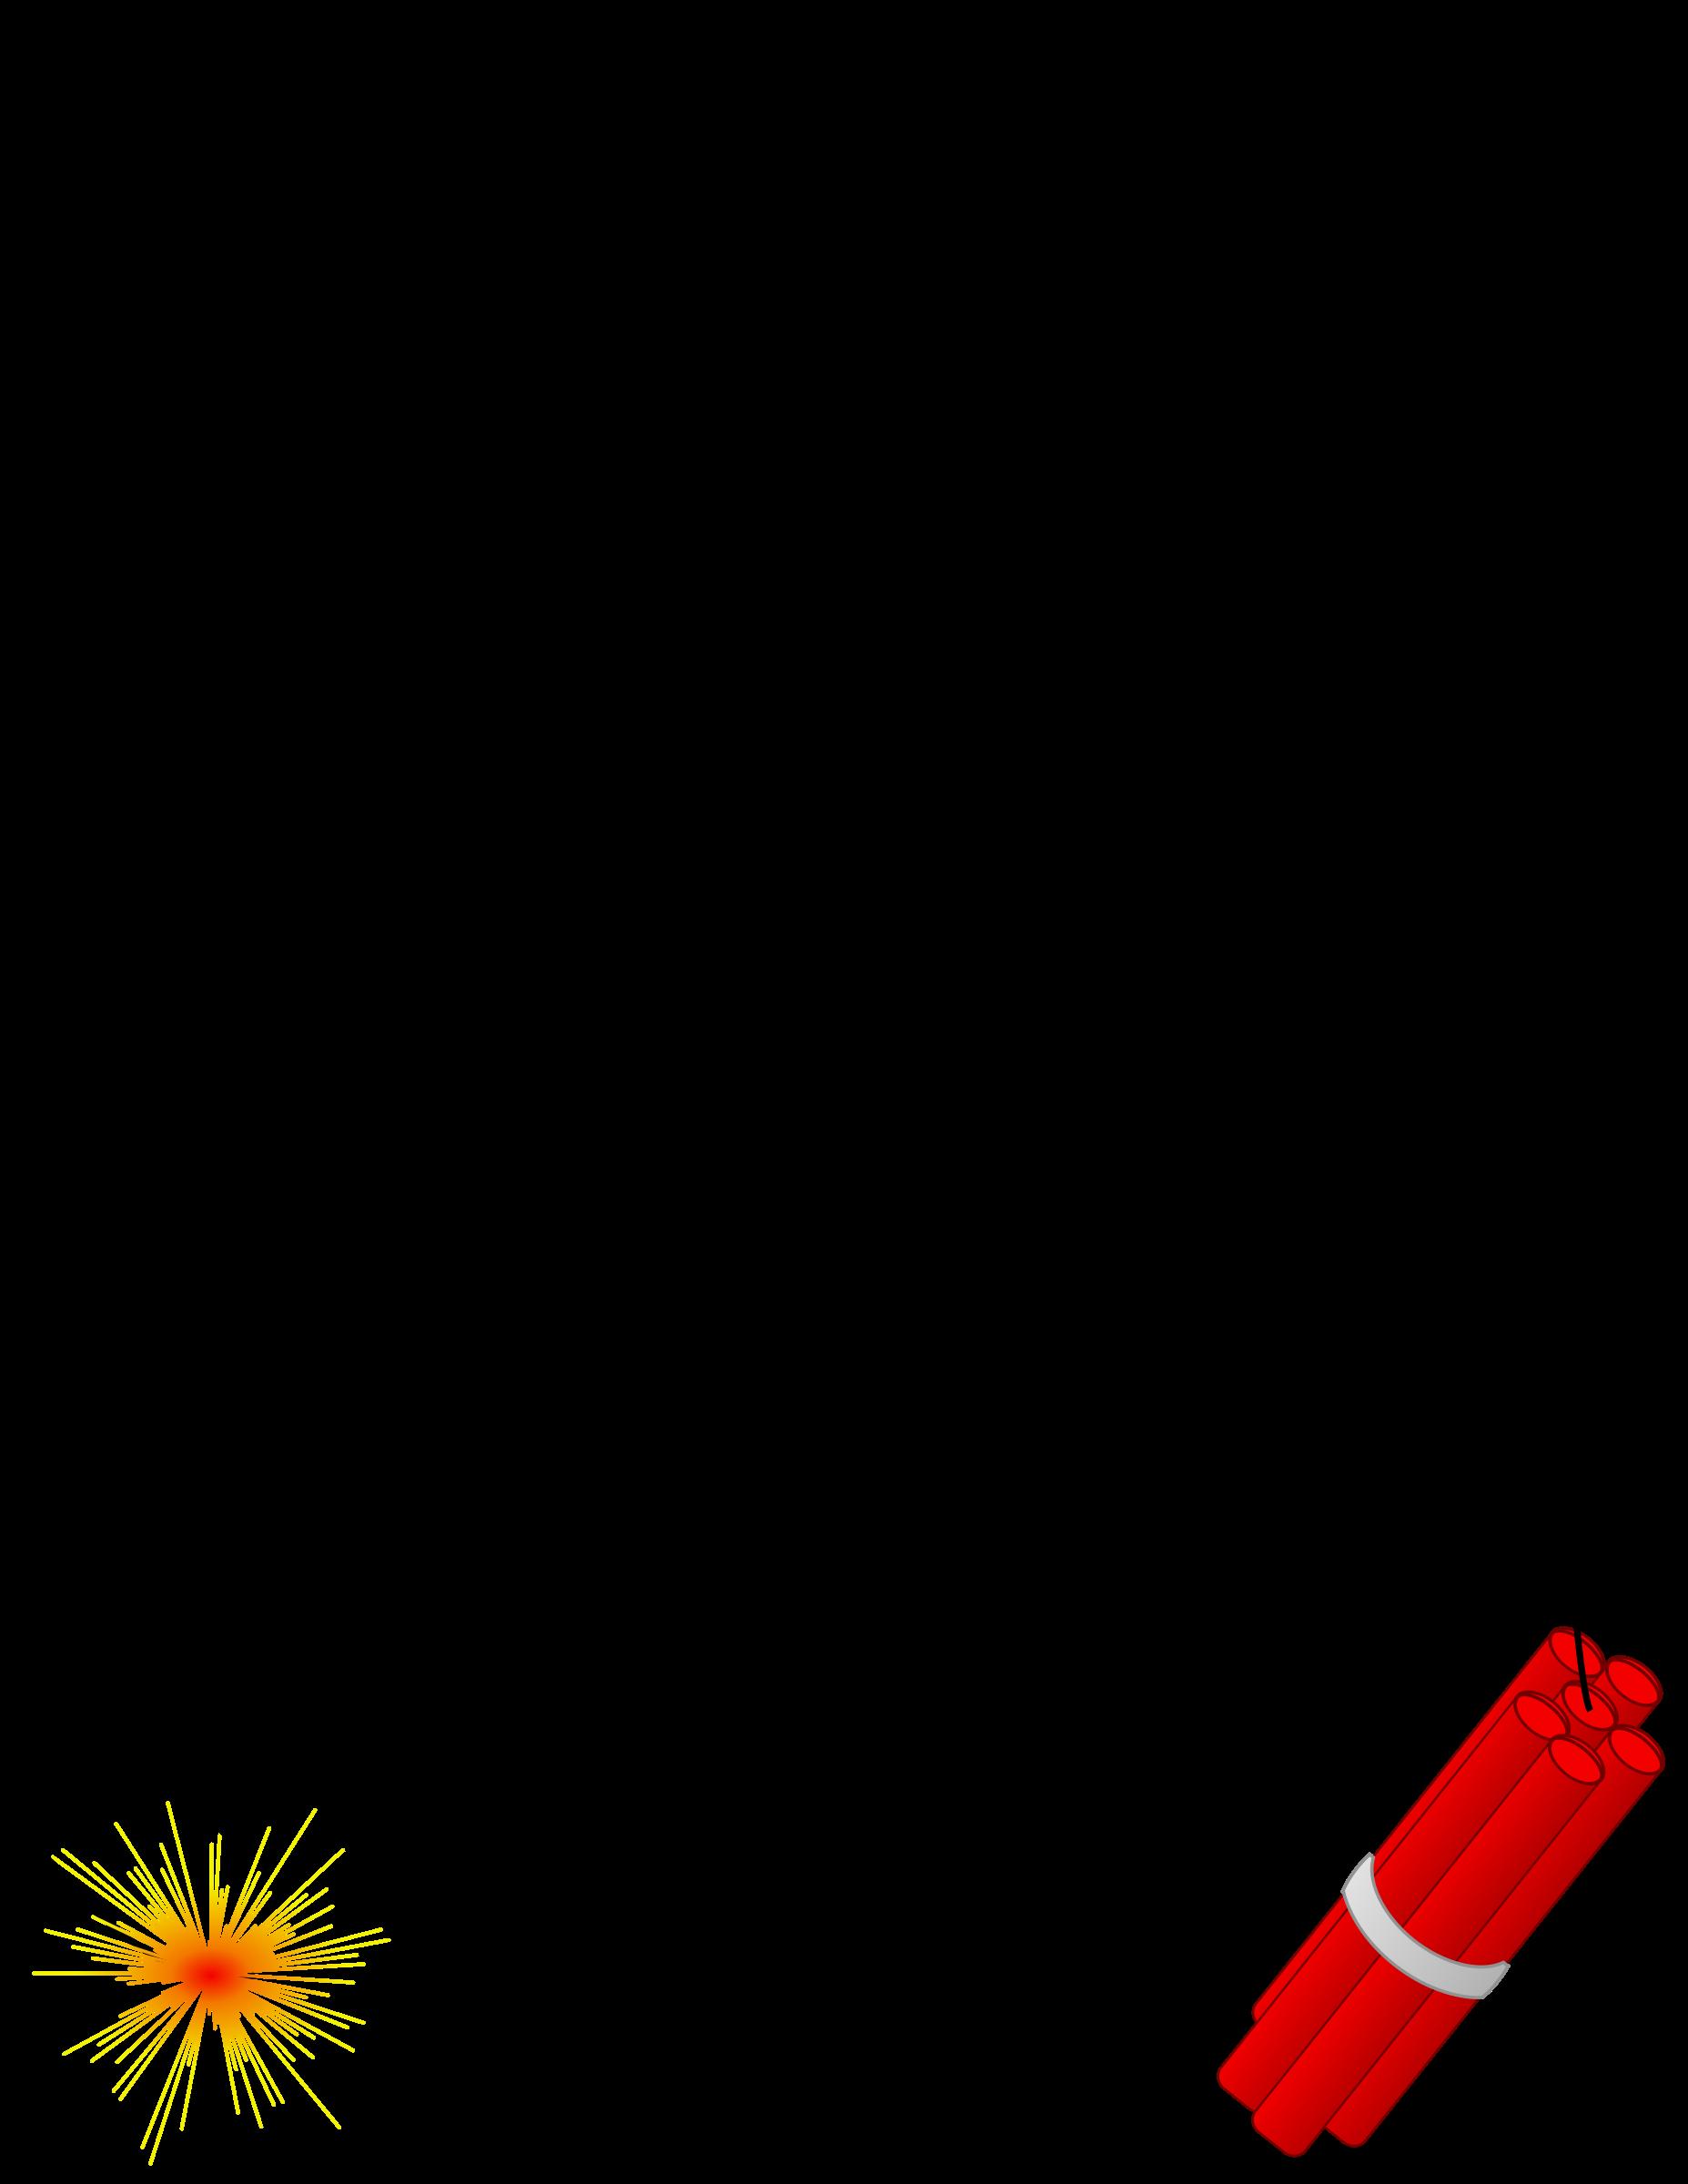 Explosion clipart dynomite. Dynamite border big image